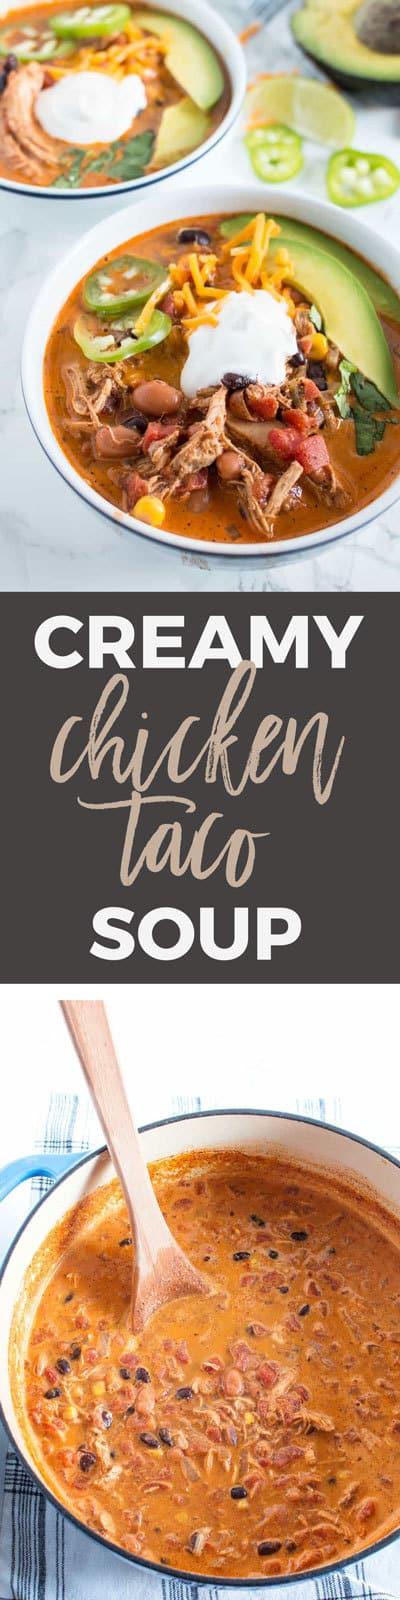 Creamy chicken taco soup pin